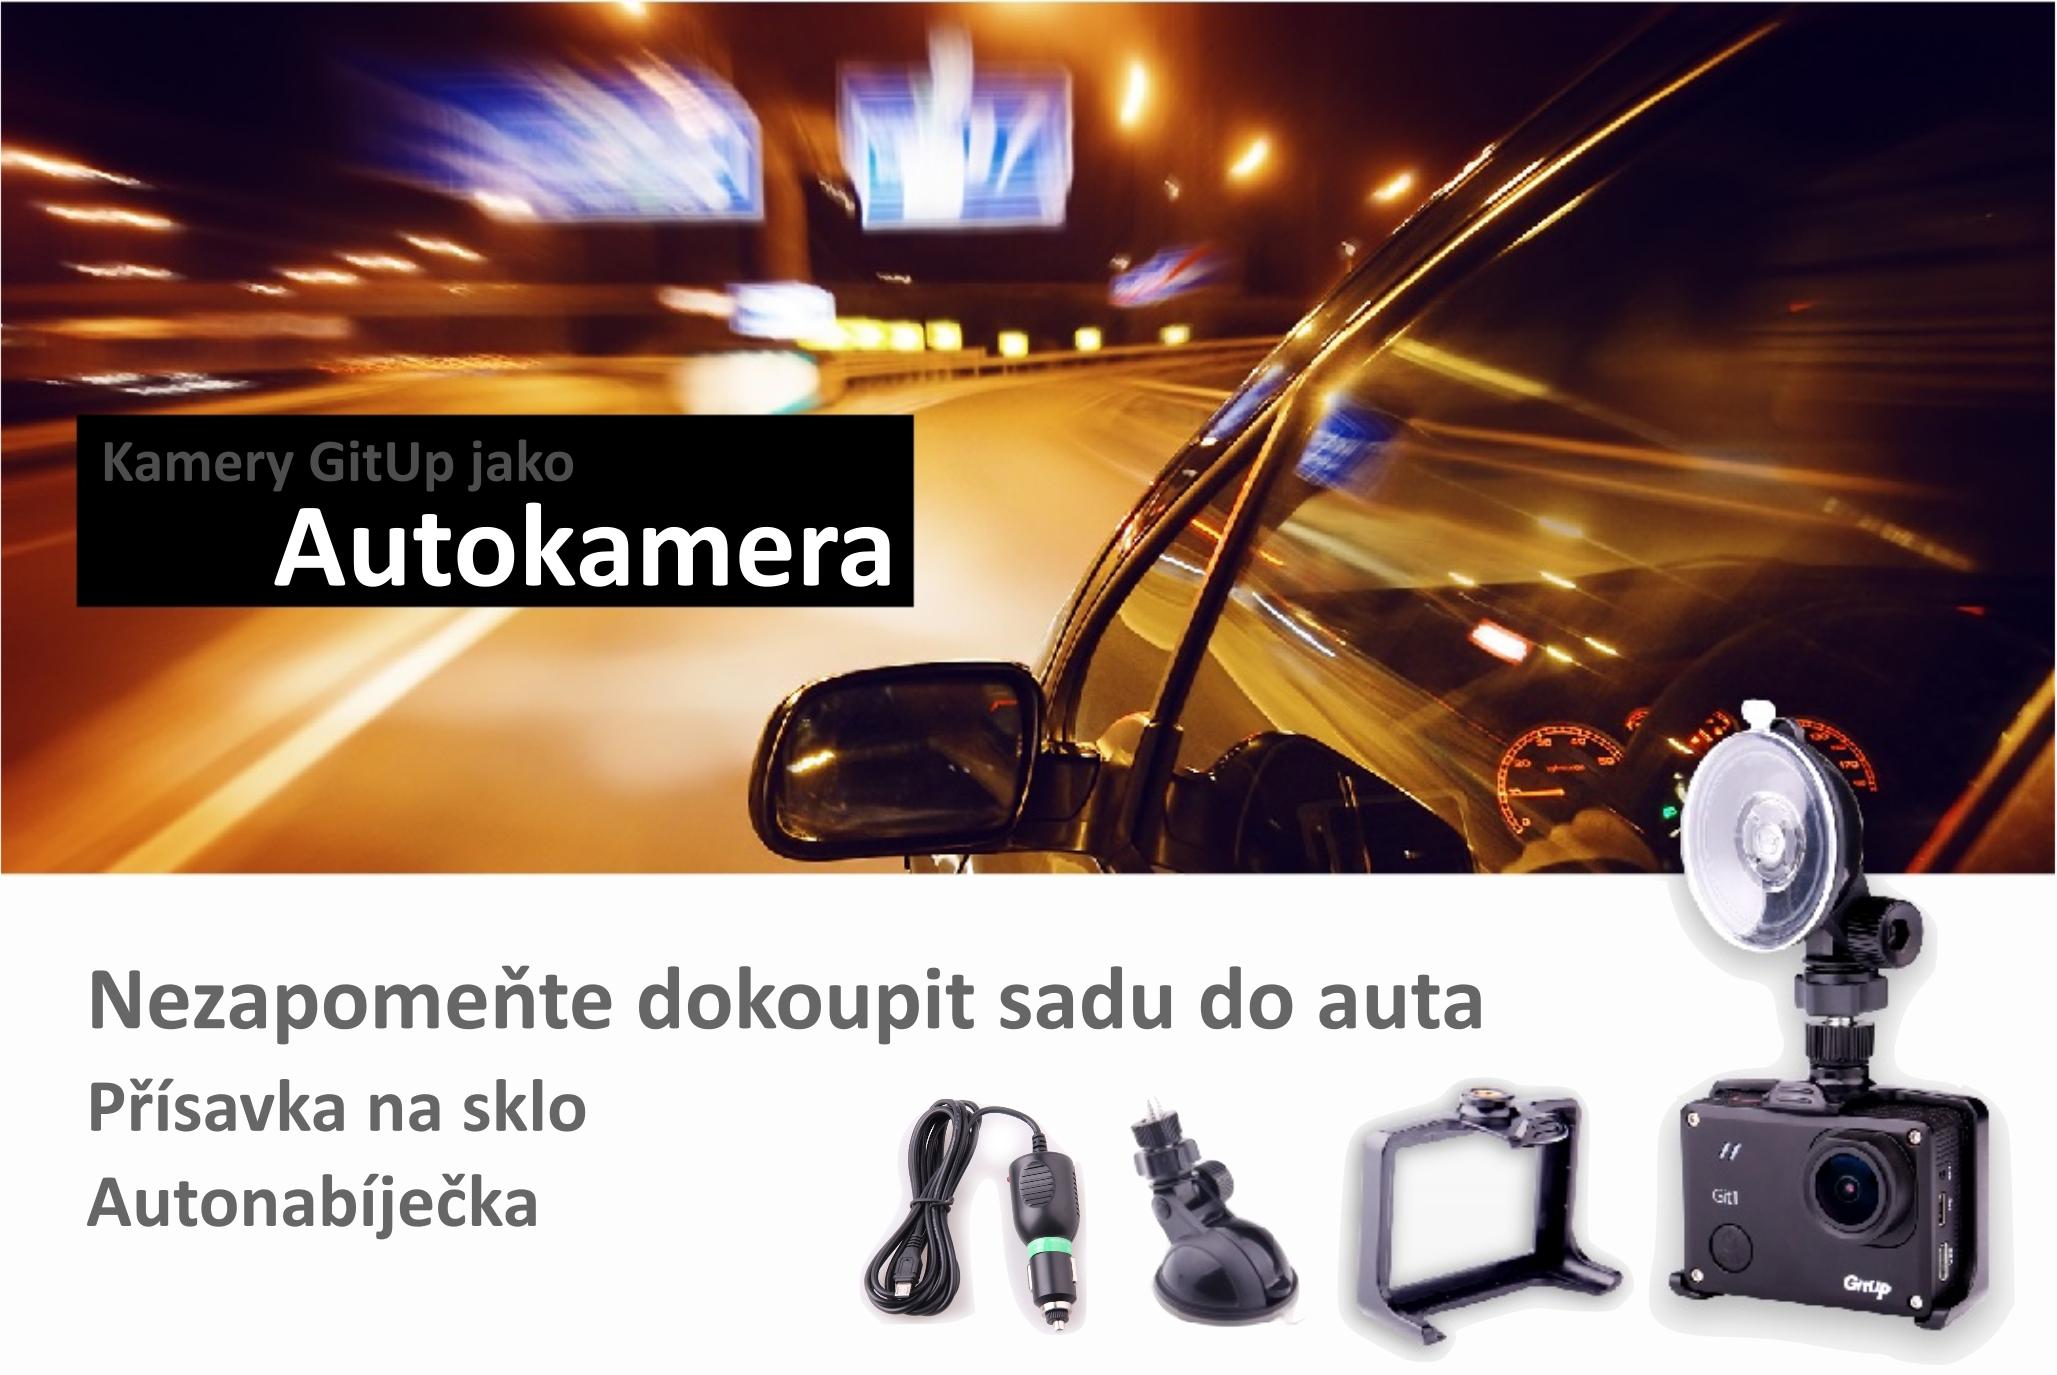 Autokamera GitUp